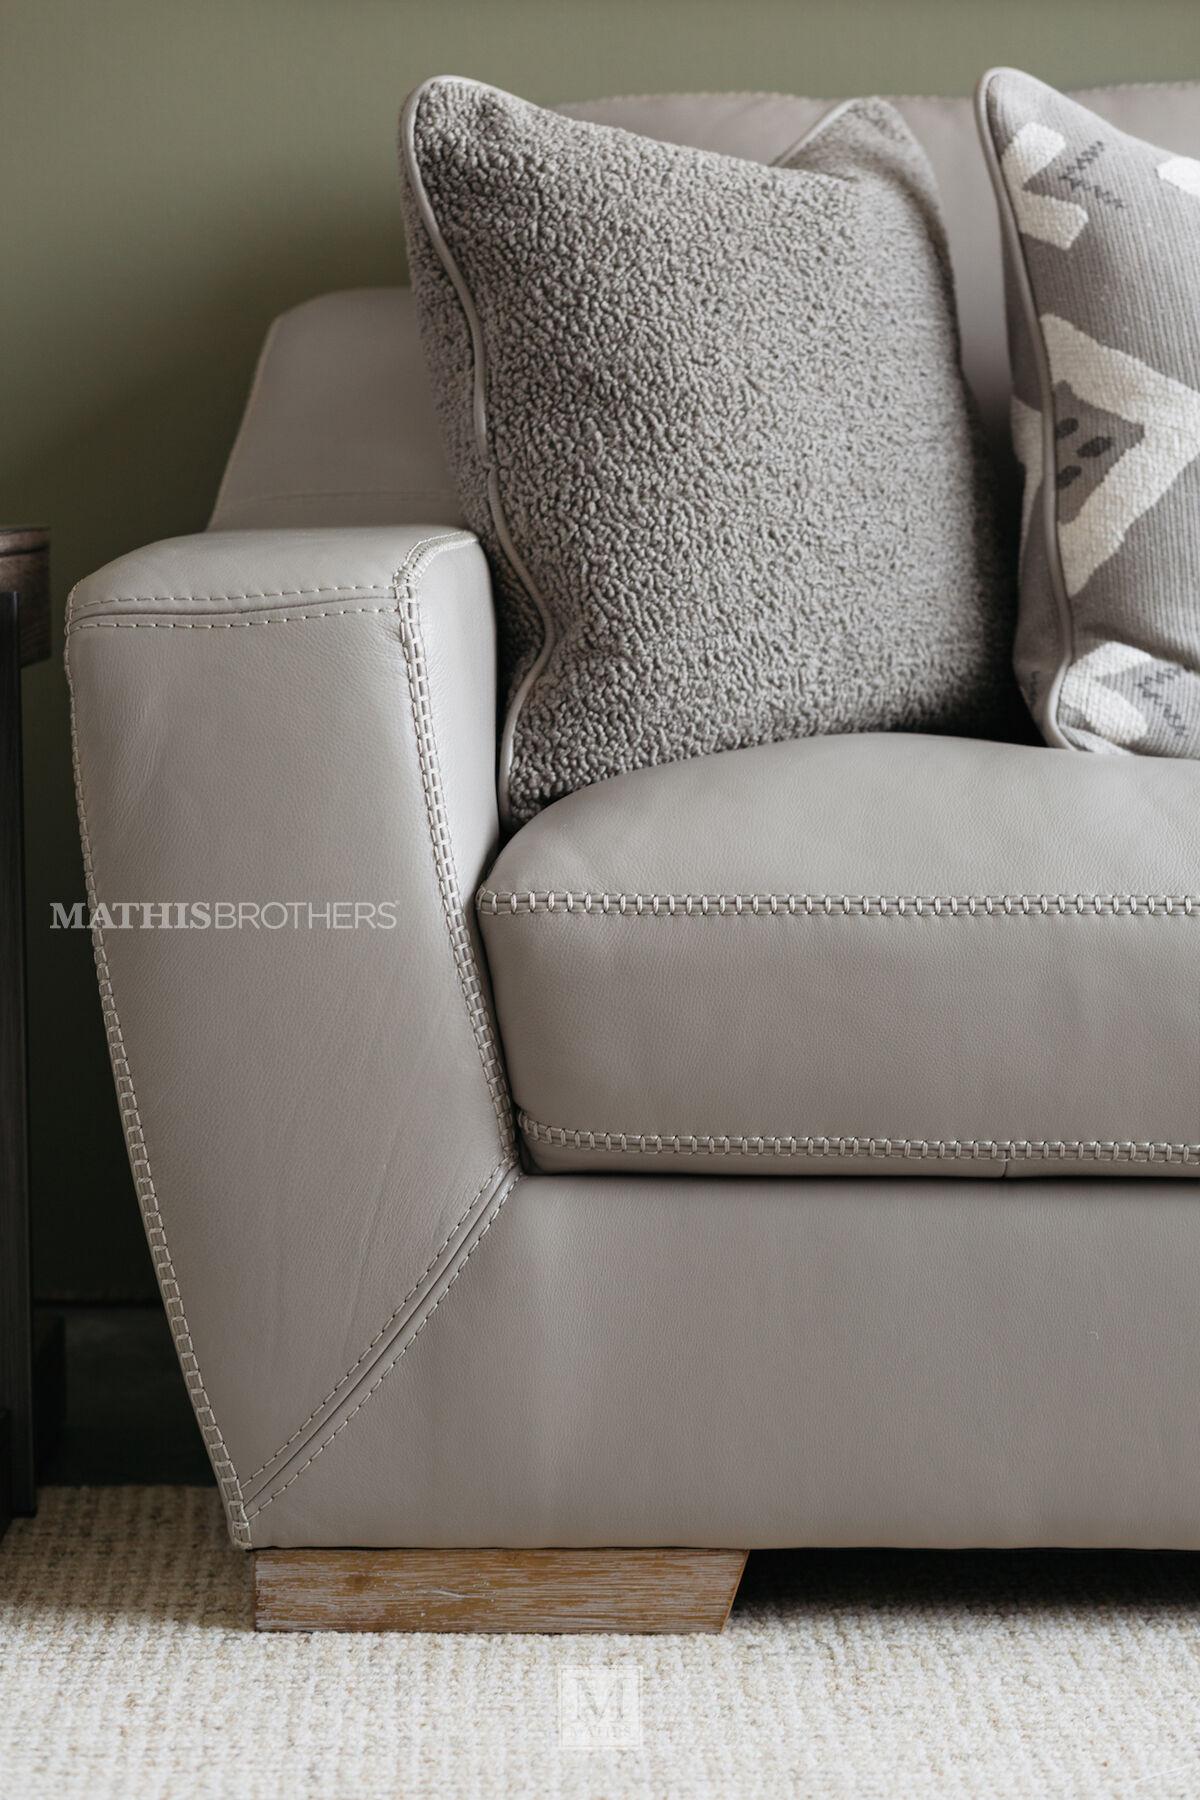 leather sofas in tulsa ok modern las vegas straight arm sofa grey | mathis brothers furniture